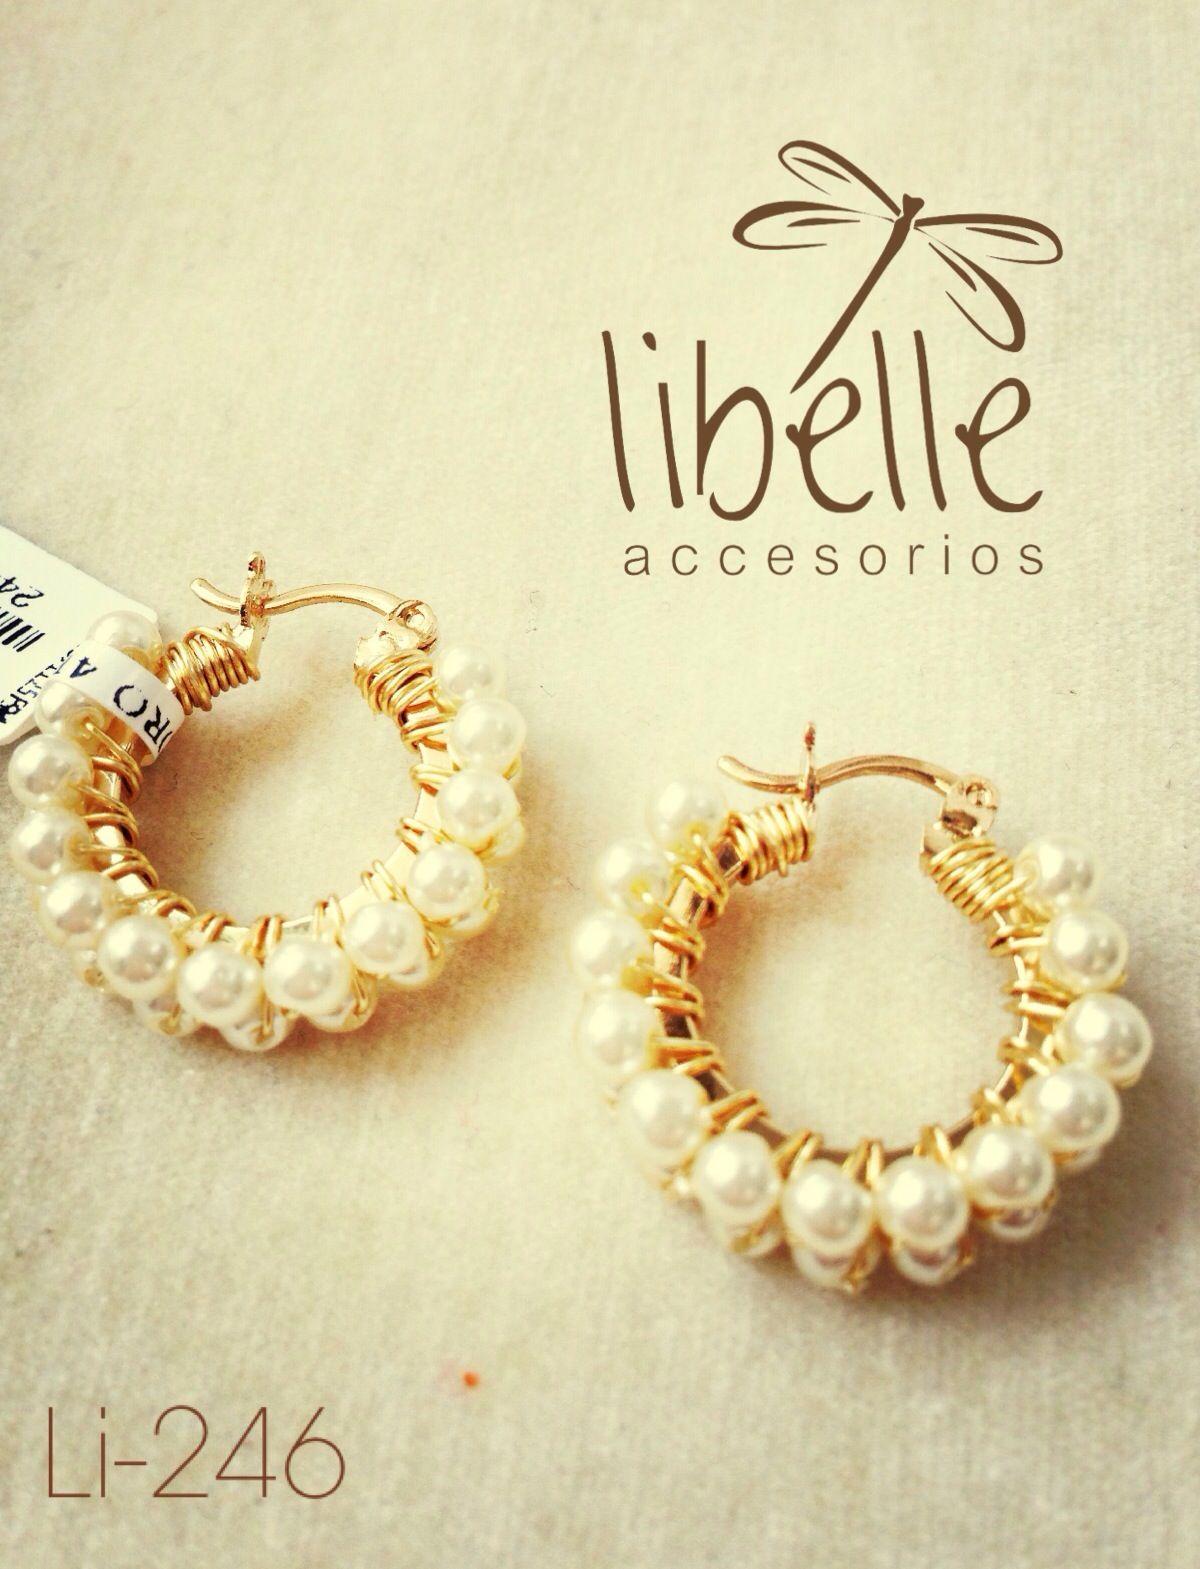 Arracadas de perlas | Joyeria | Pinterest | Jewelry ideas, Beads and ...